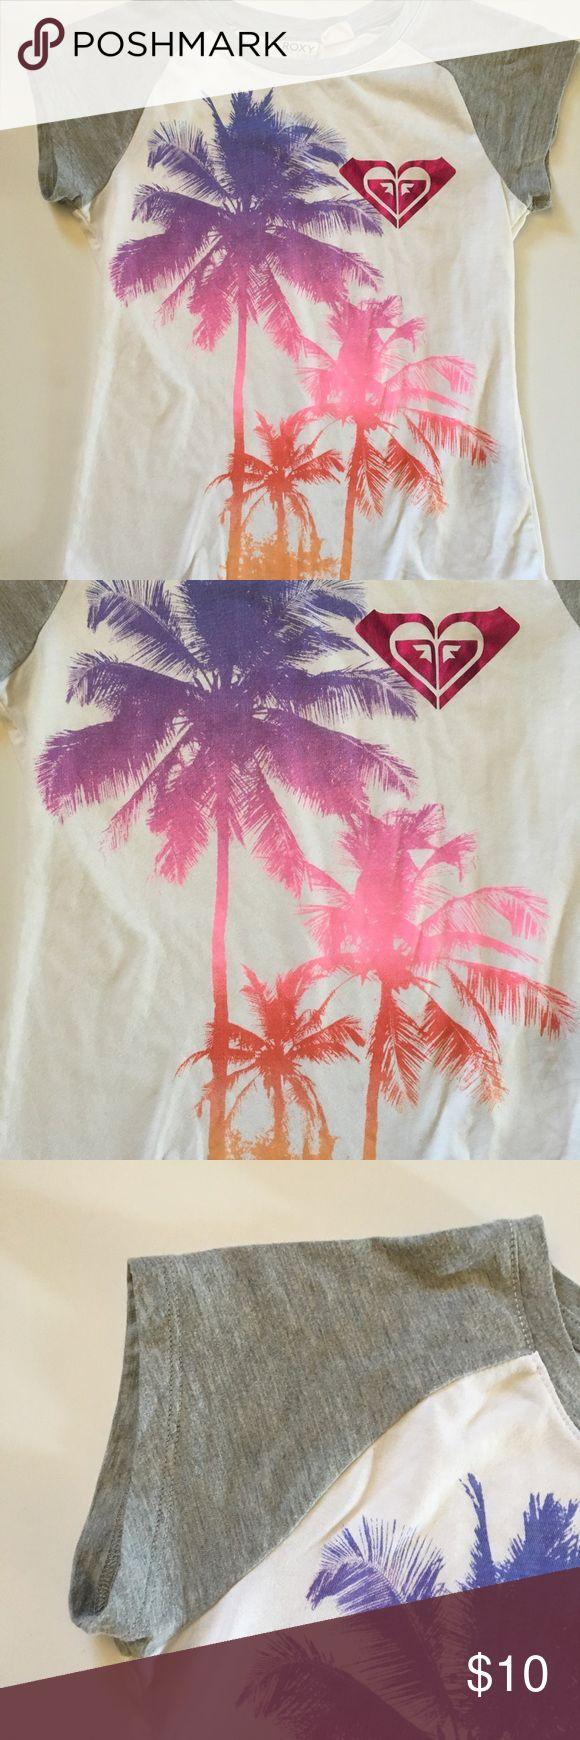 Roxy Tee Roxy Tee.  Short sleeves.  Palm trees and Roxy logo on front. Size 12/14 (M). Roxy Shirts & Tops Tees - Short Sleeve